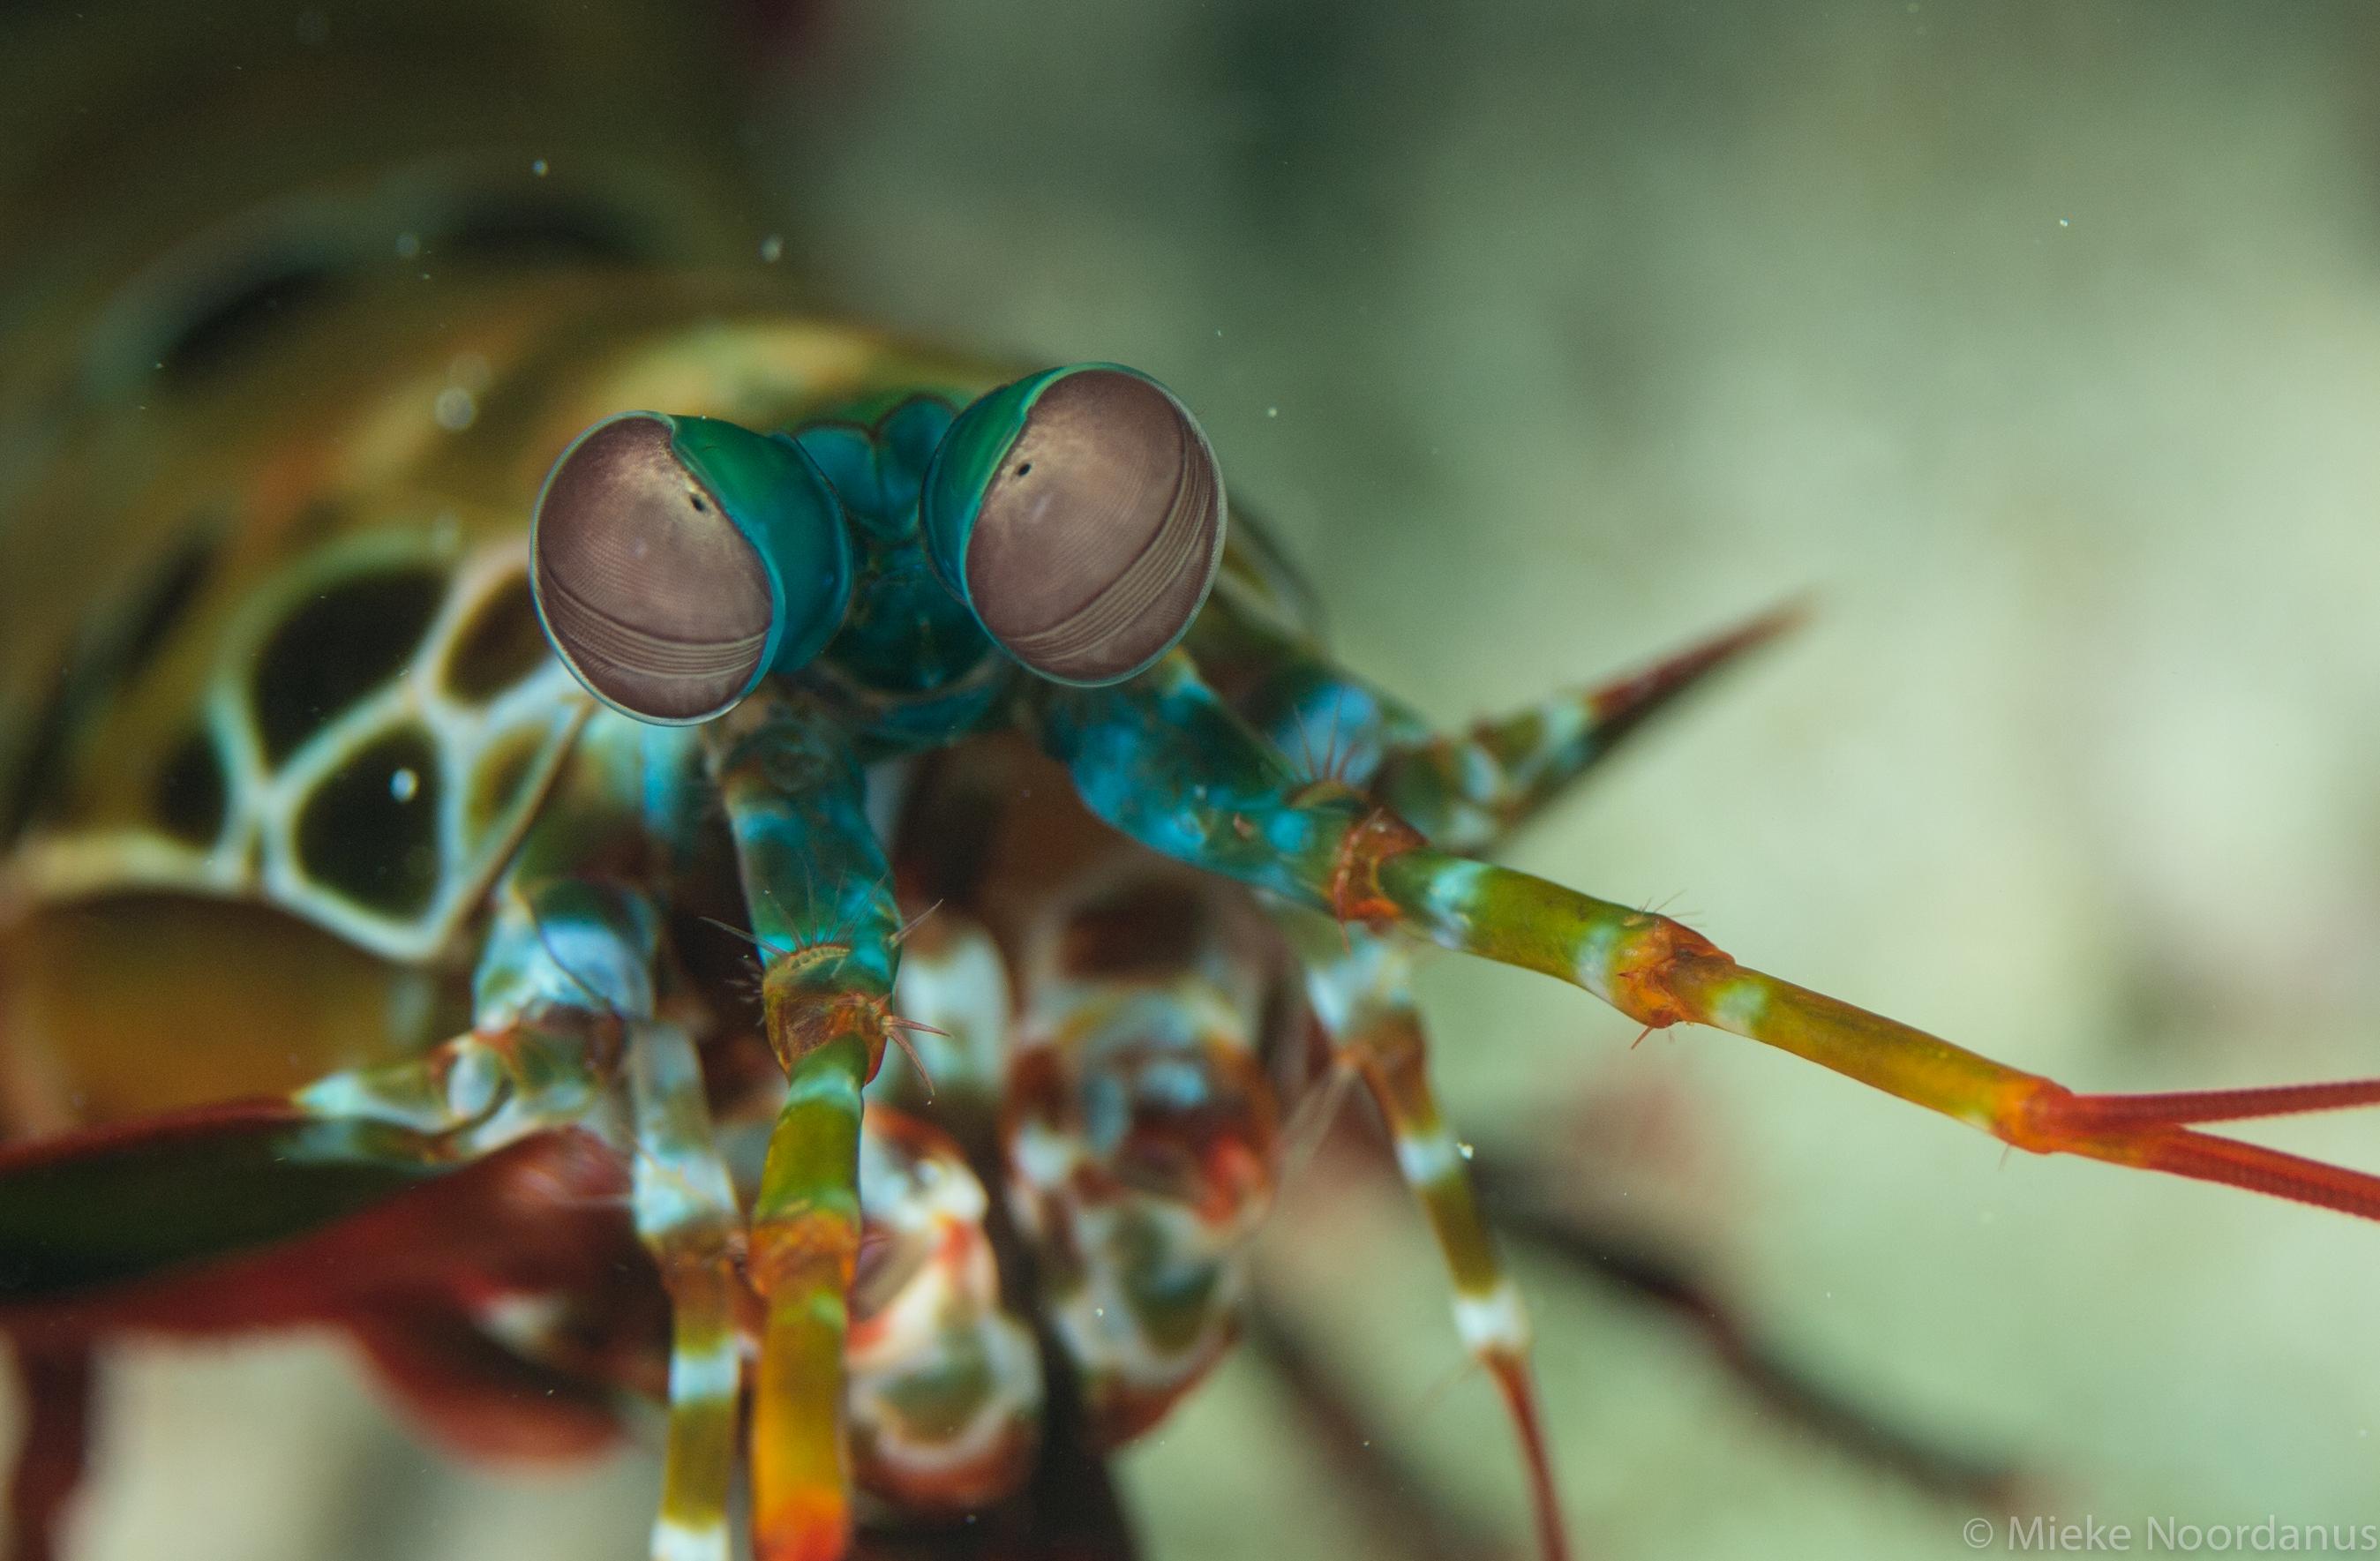 mieke-noordanus_peacockmantis_shrimp-52596